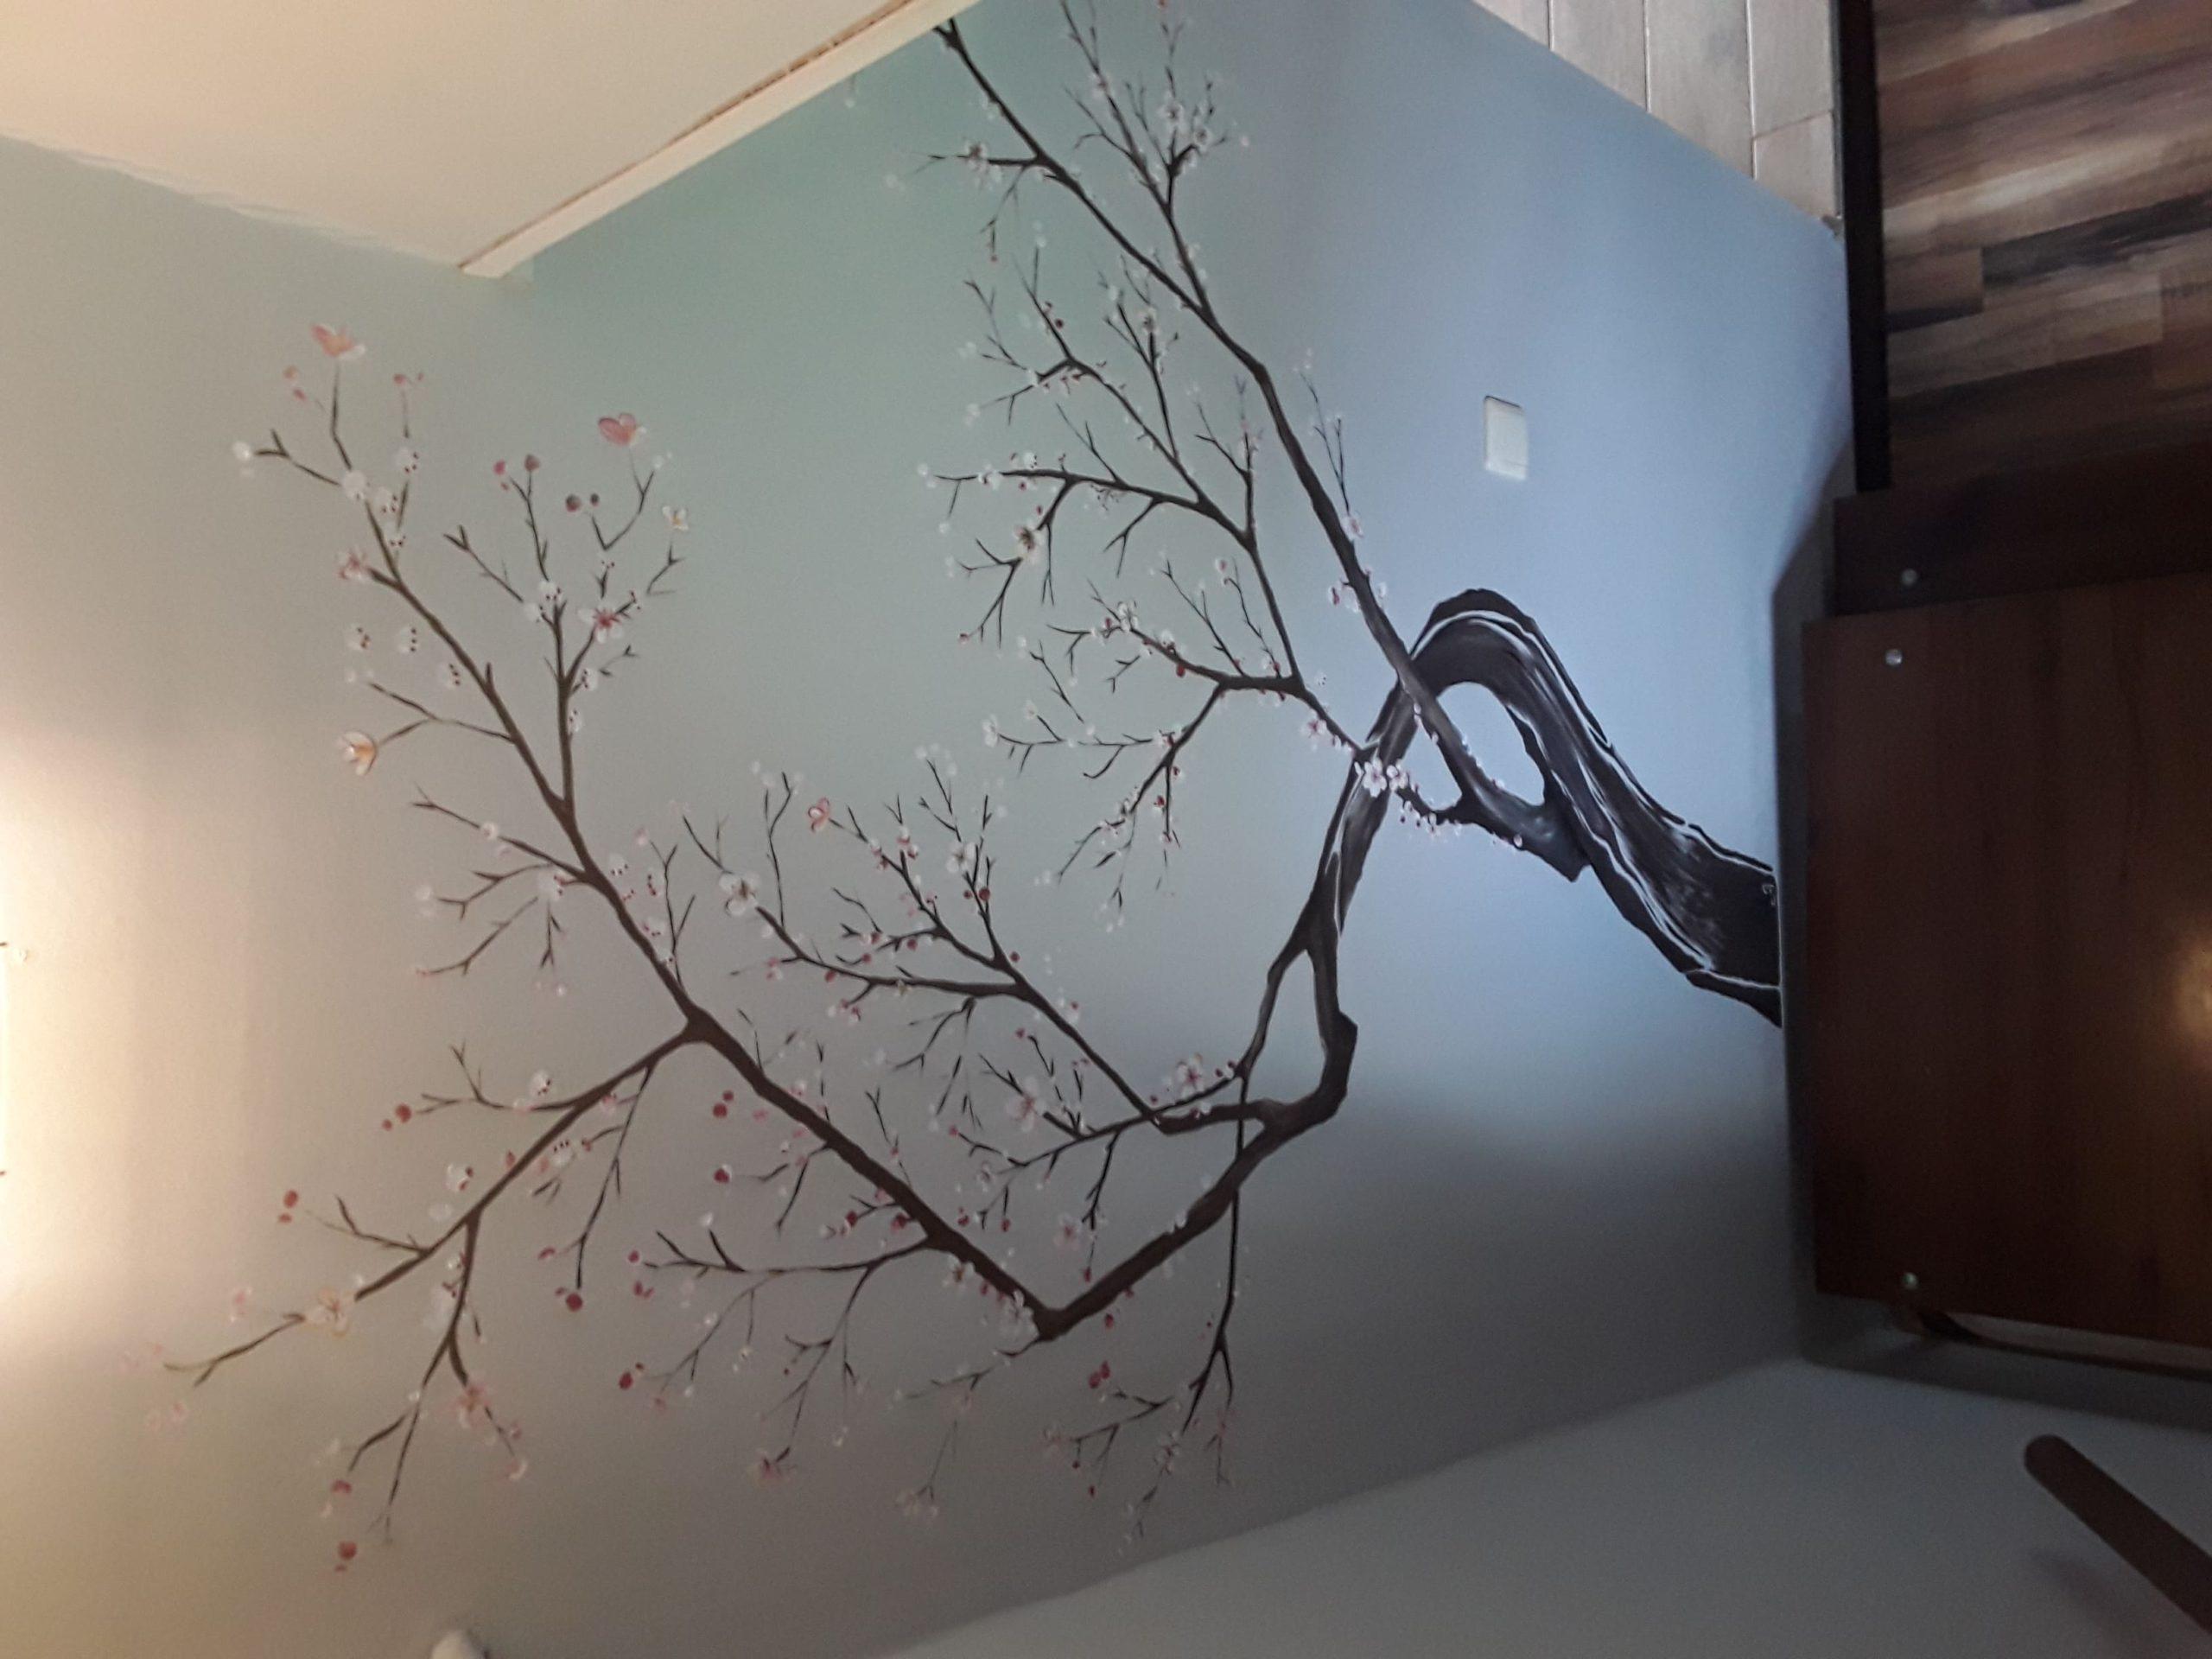 menine-kuryba-sienu-dekoravimas-ivairus-interjerai (27)